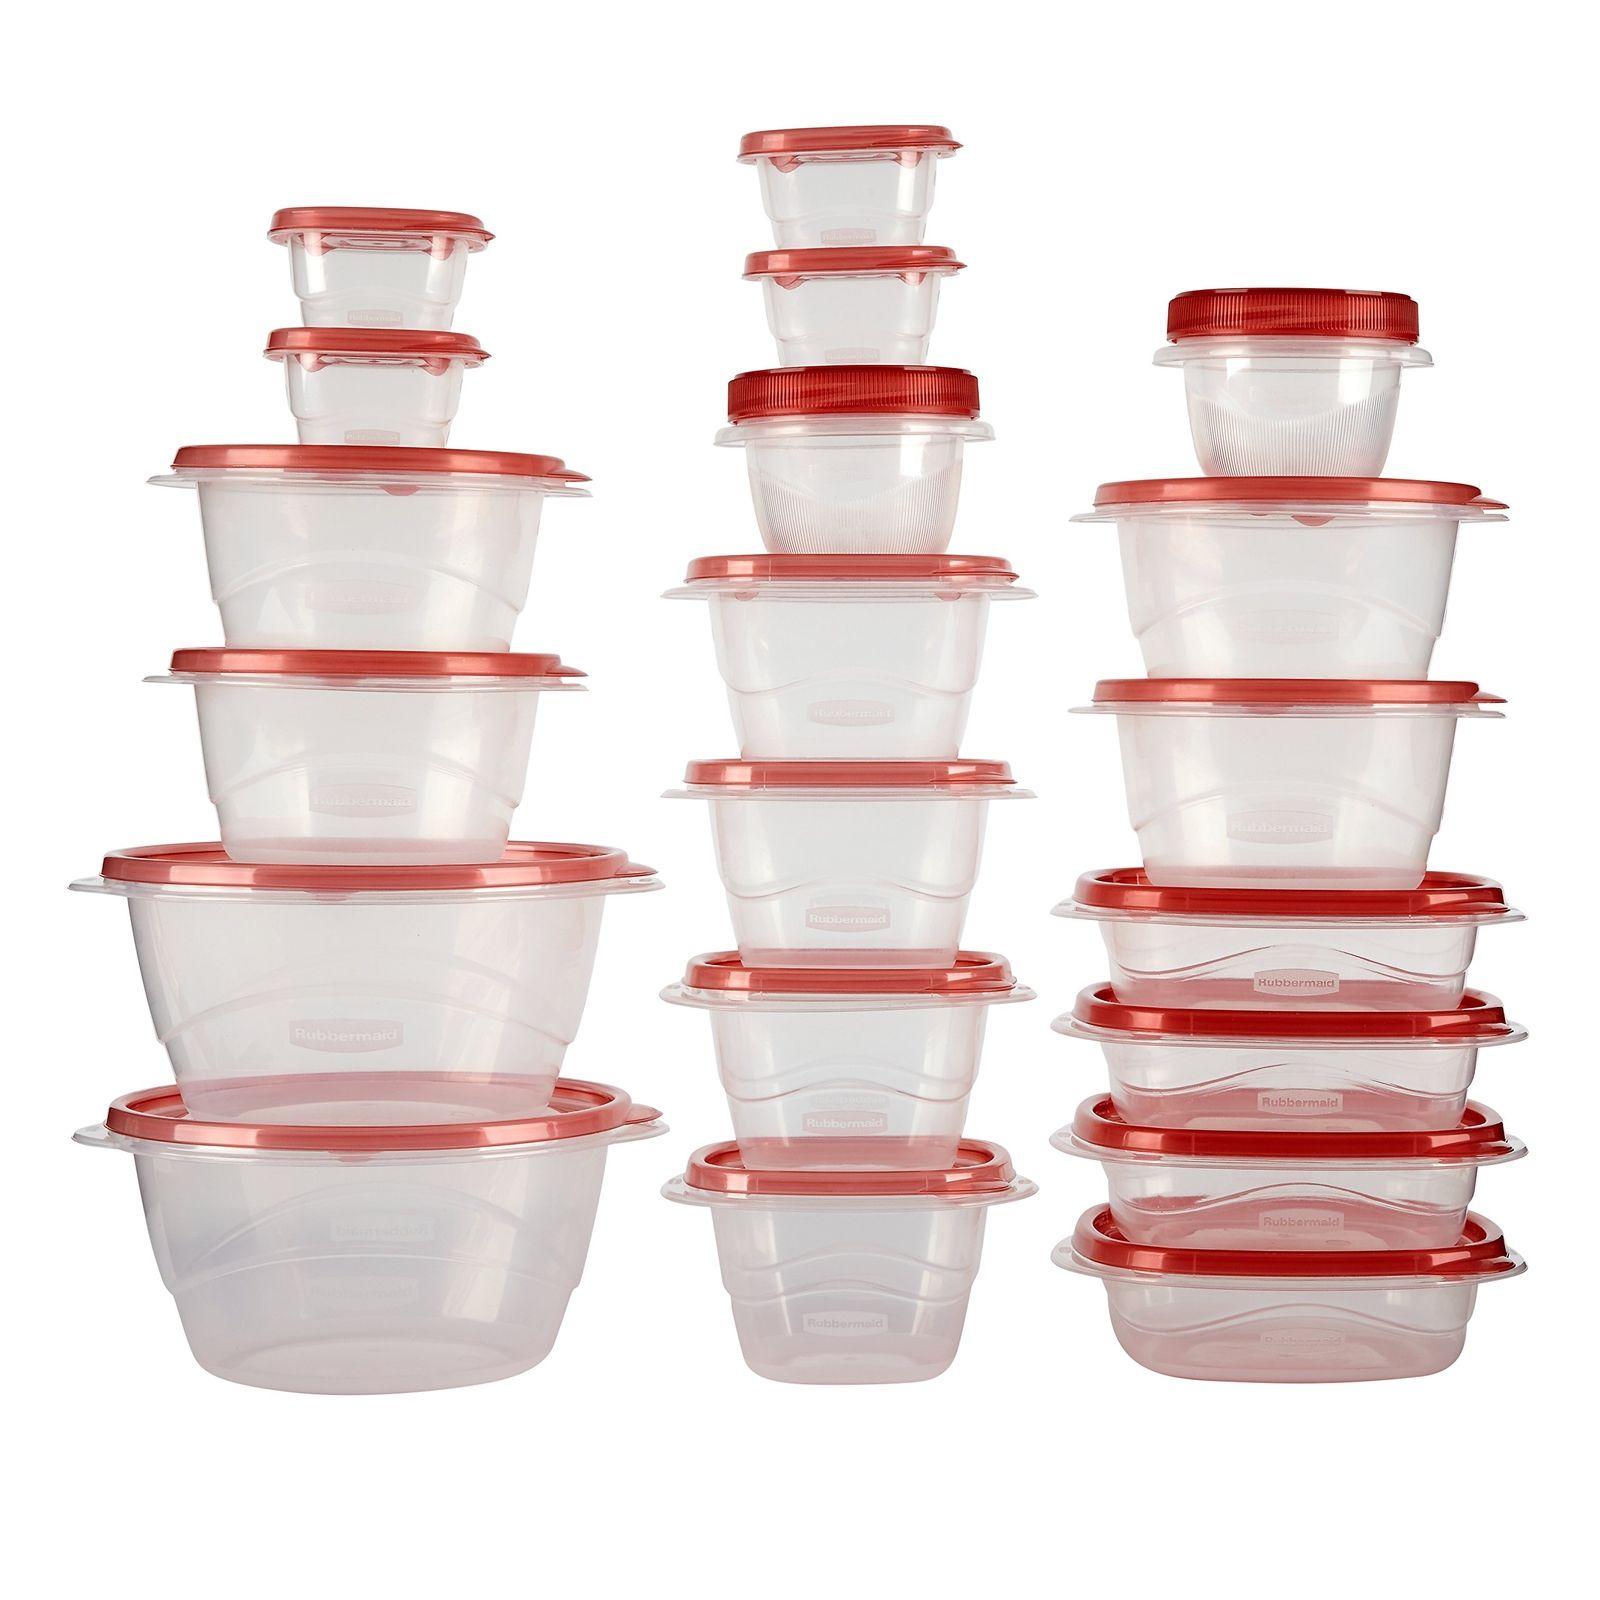 40 Piece Food Storage Containers Set Seal Lid BPA Free Dishwasher Freezer Safe 1